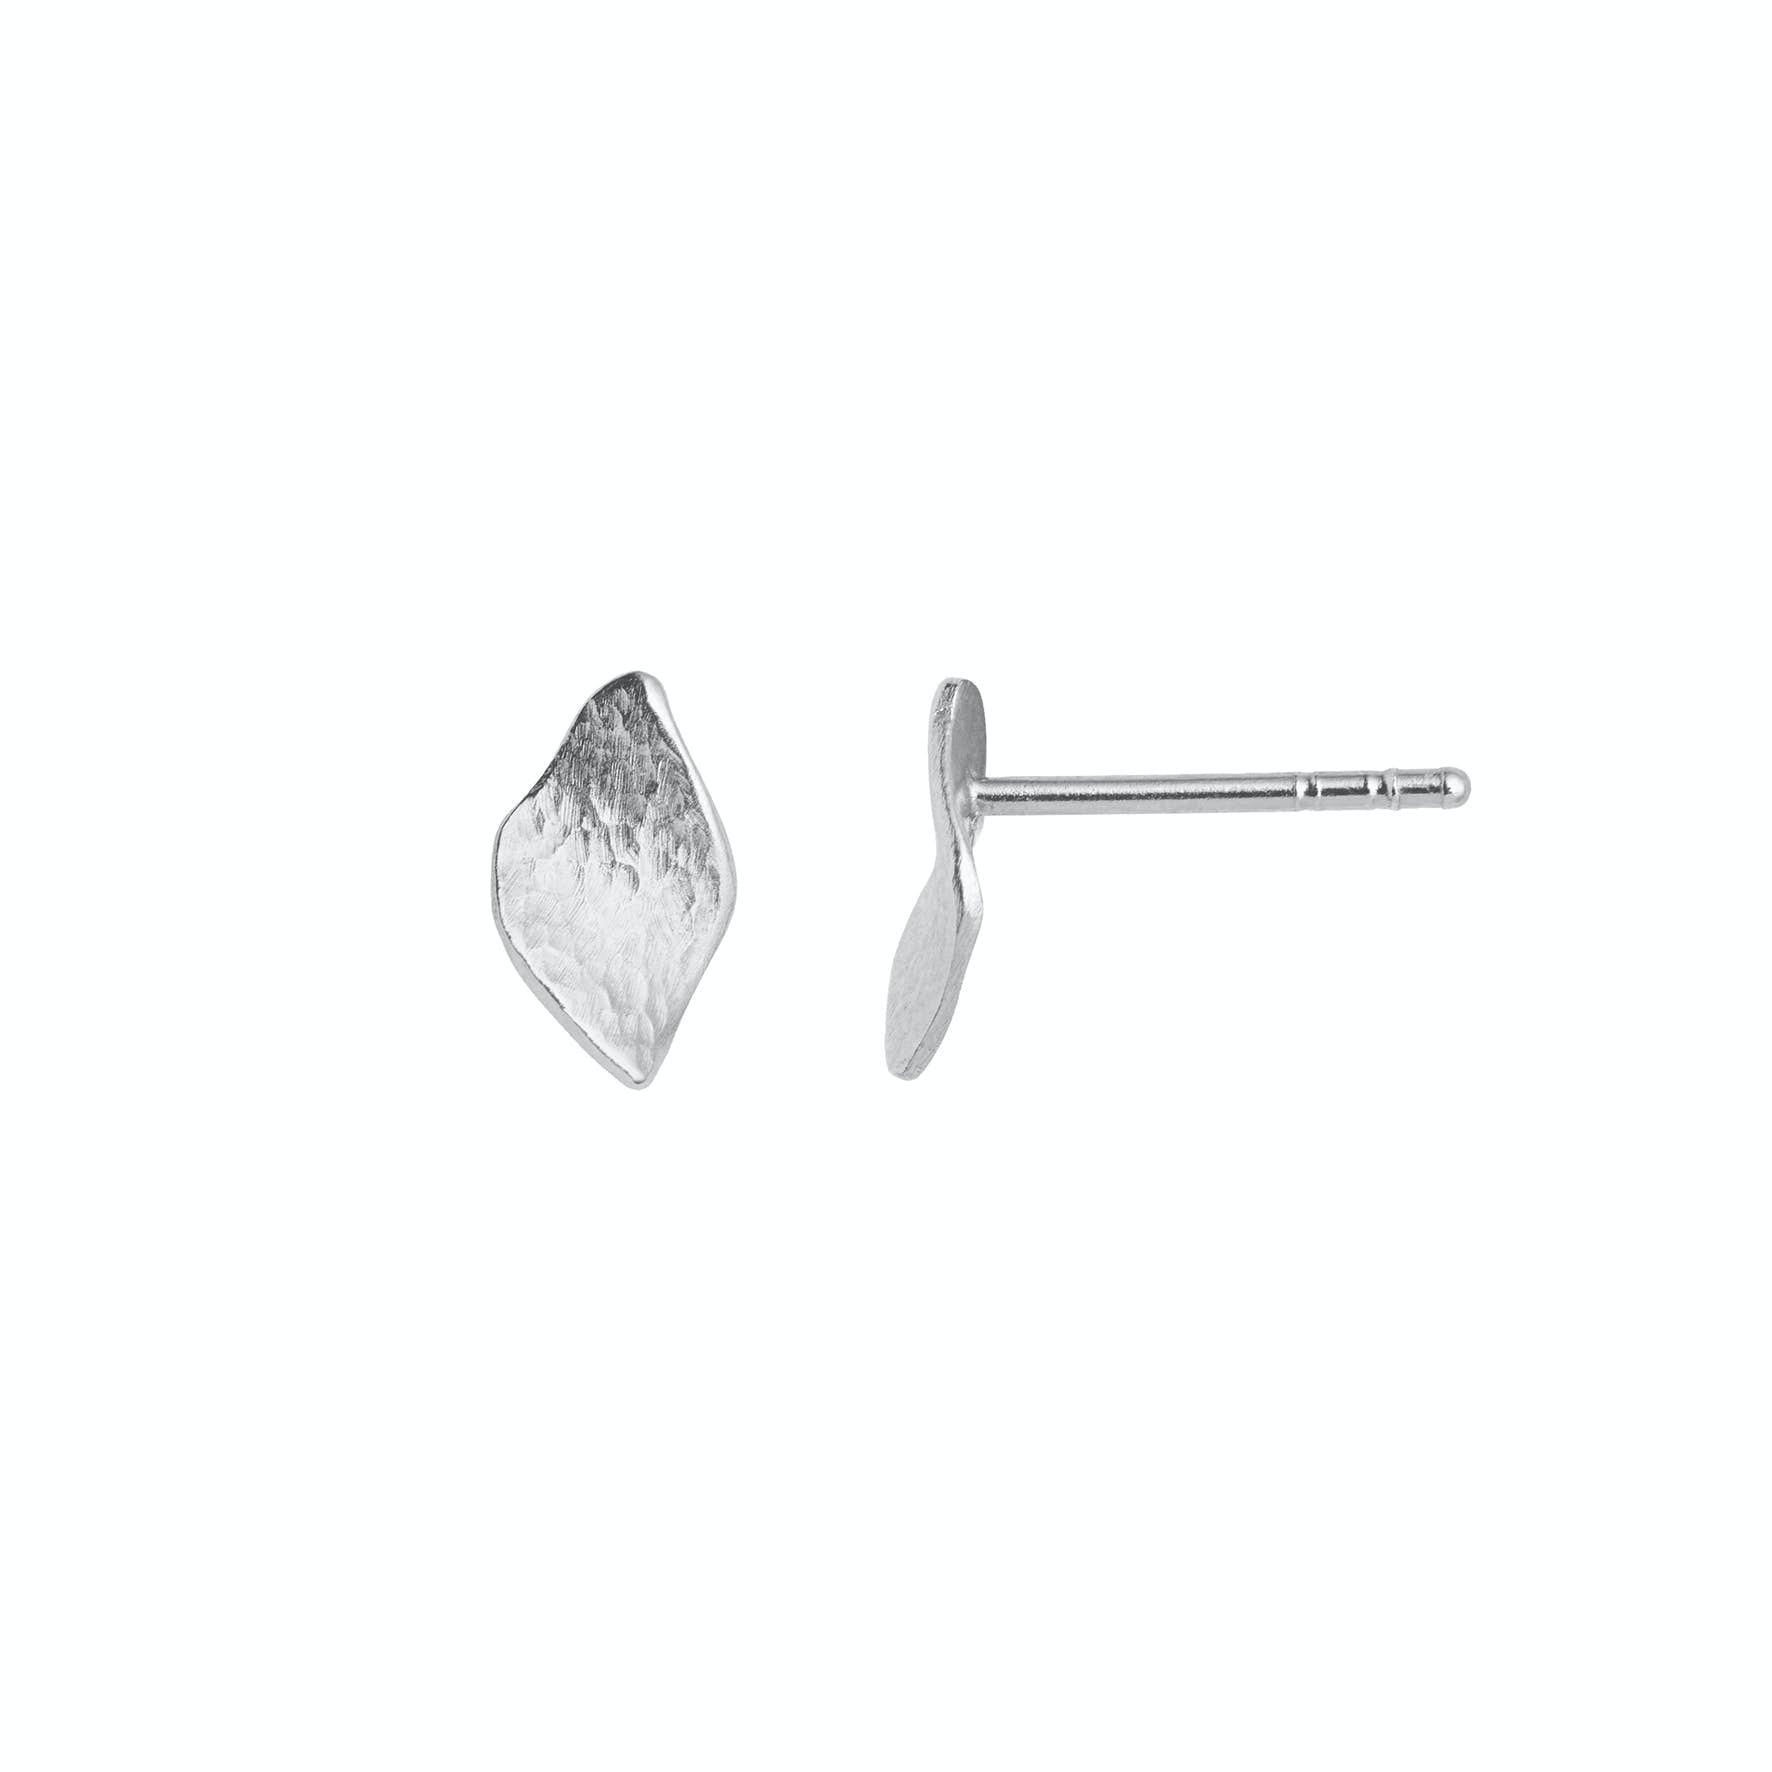 Petit Ile De L'Amour Earstick von STINE A Jewelry in Silber Sterling 925